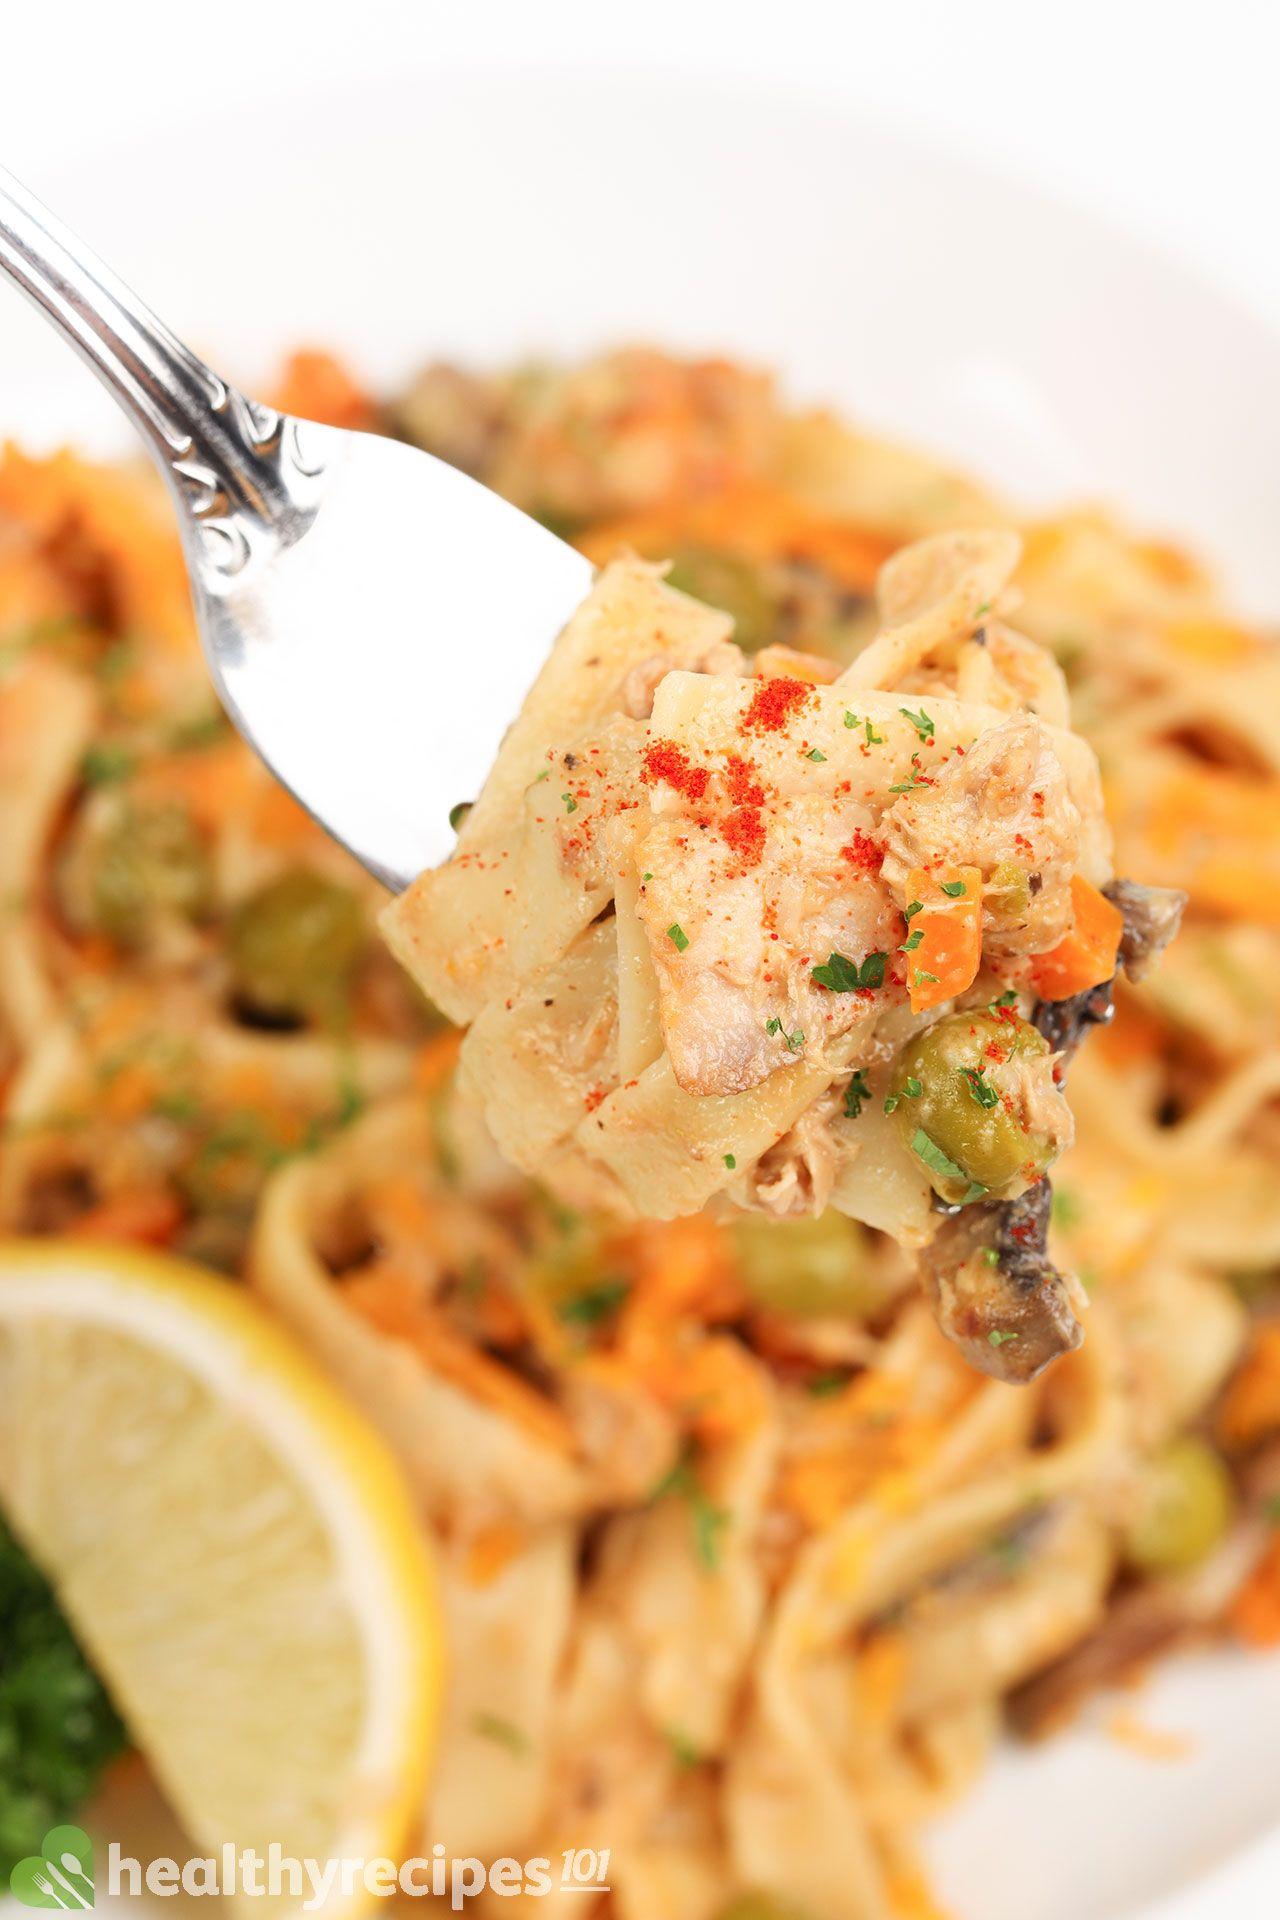 Homemade Instant Pot Tuna Casserole Recipe